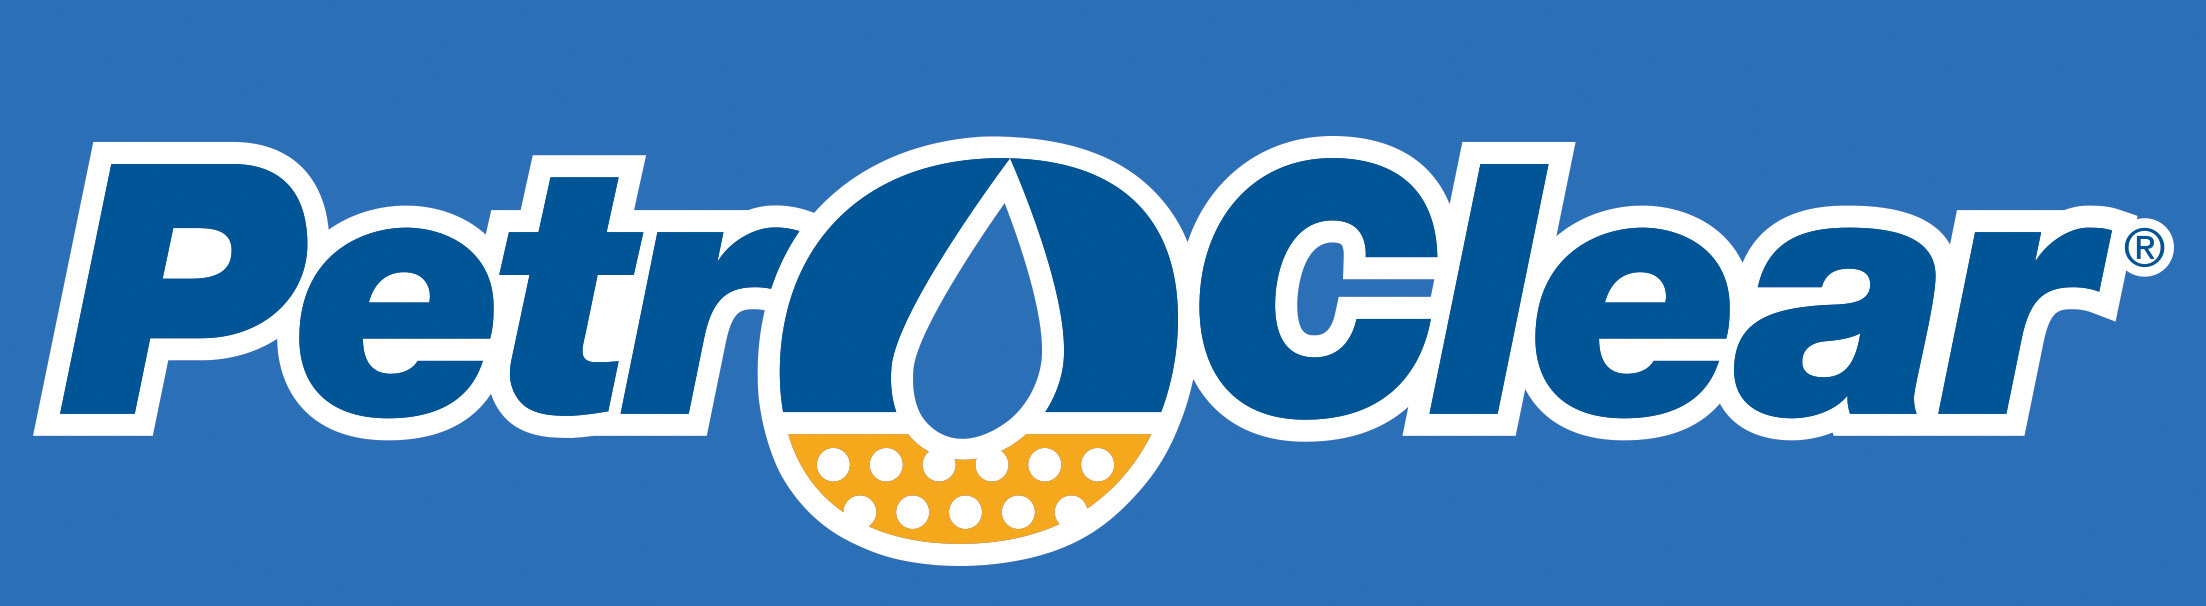 PetroClear Logo Outline on Blue